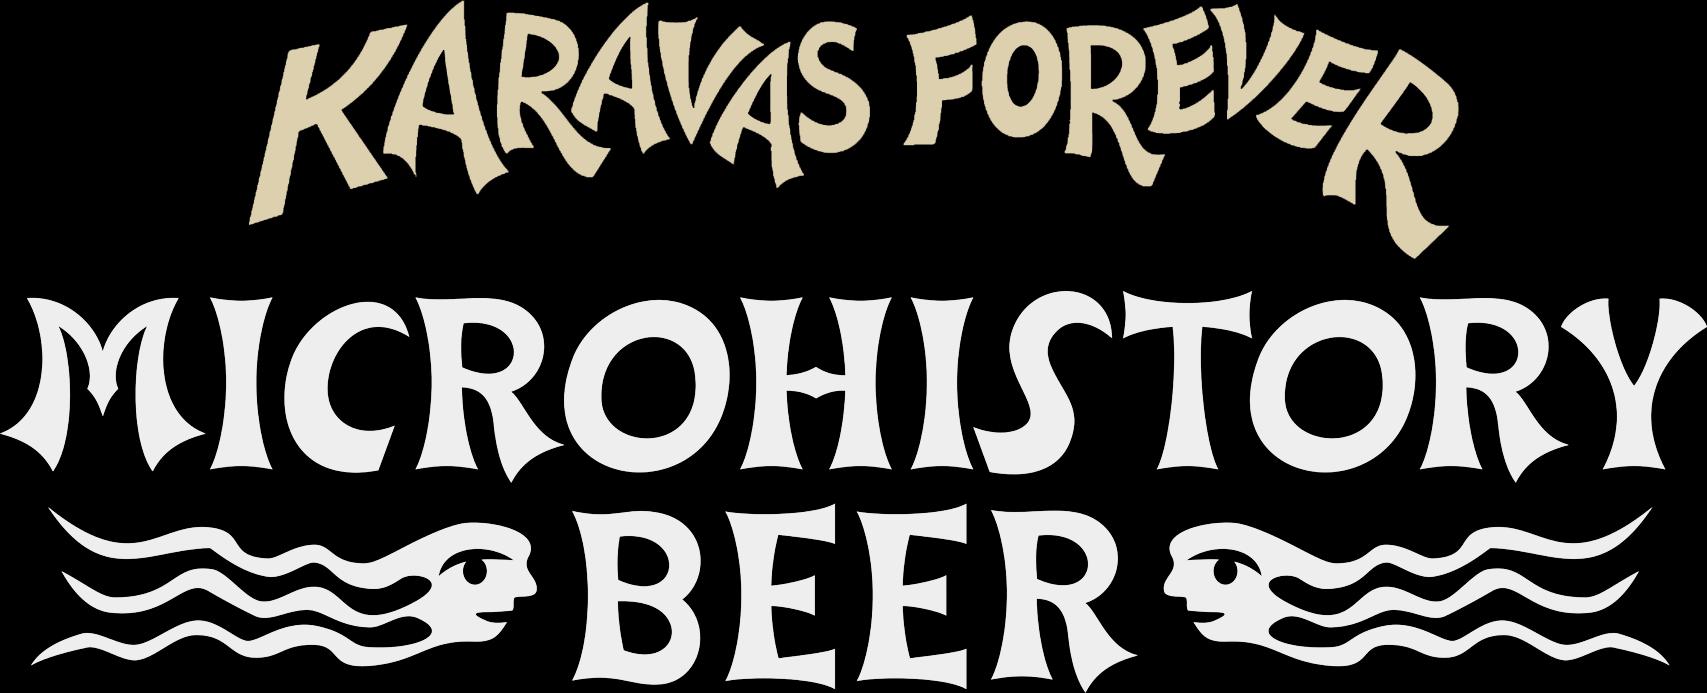 karavas-logo-microhistorybeer.com